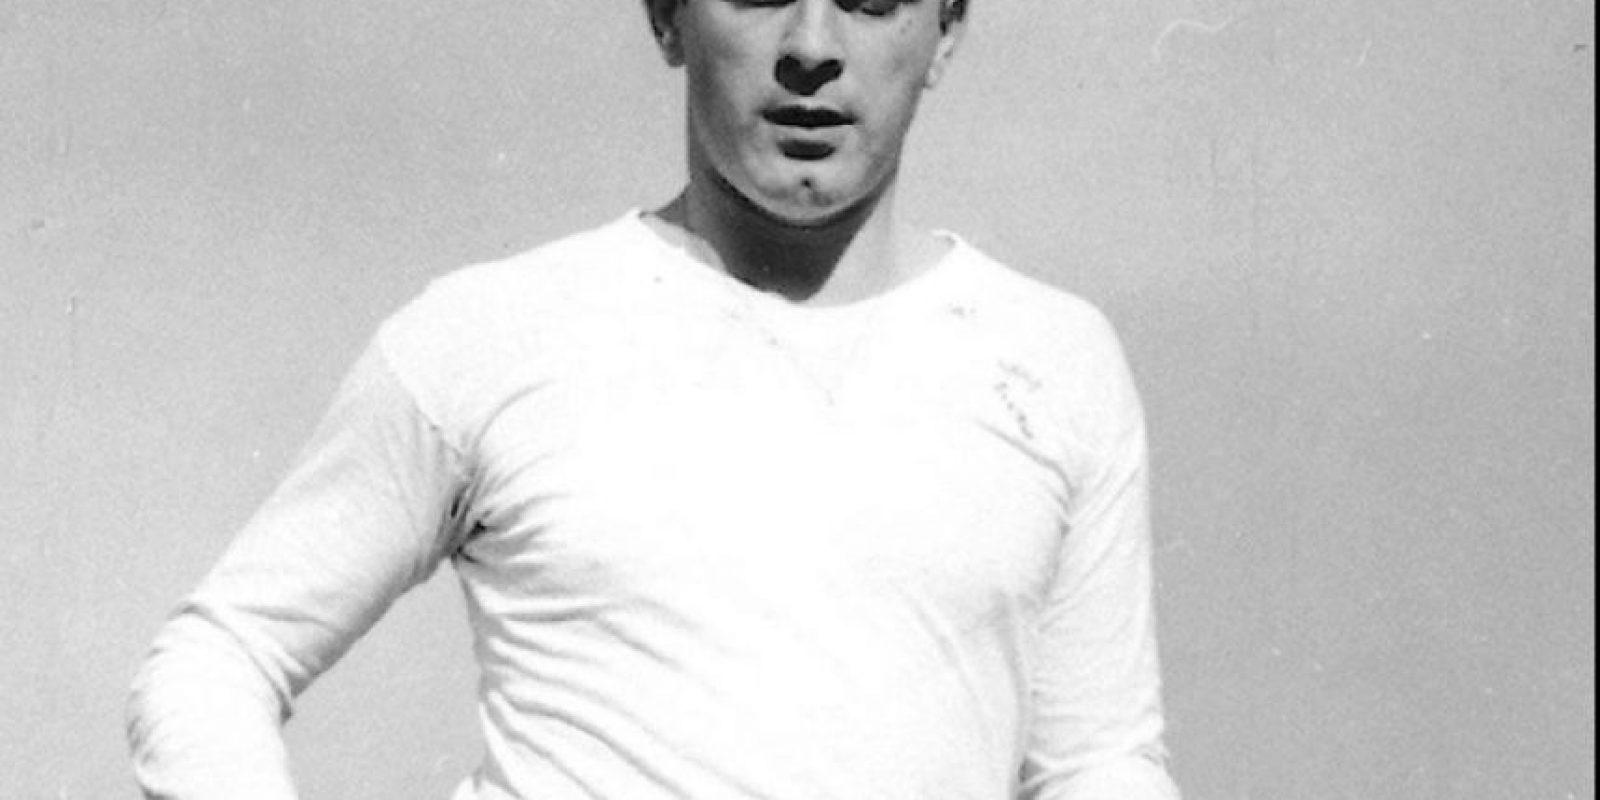 El mítico jugador del Real Madrid marcó 49 goles Foto:Getty